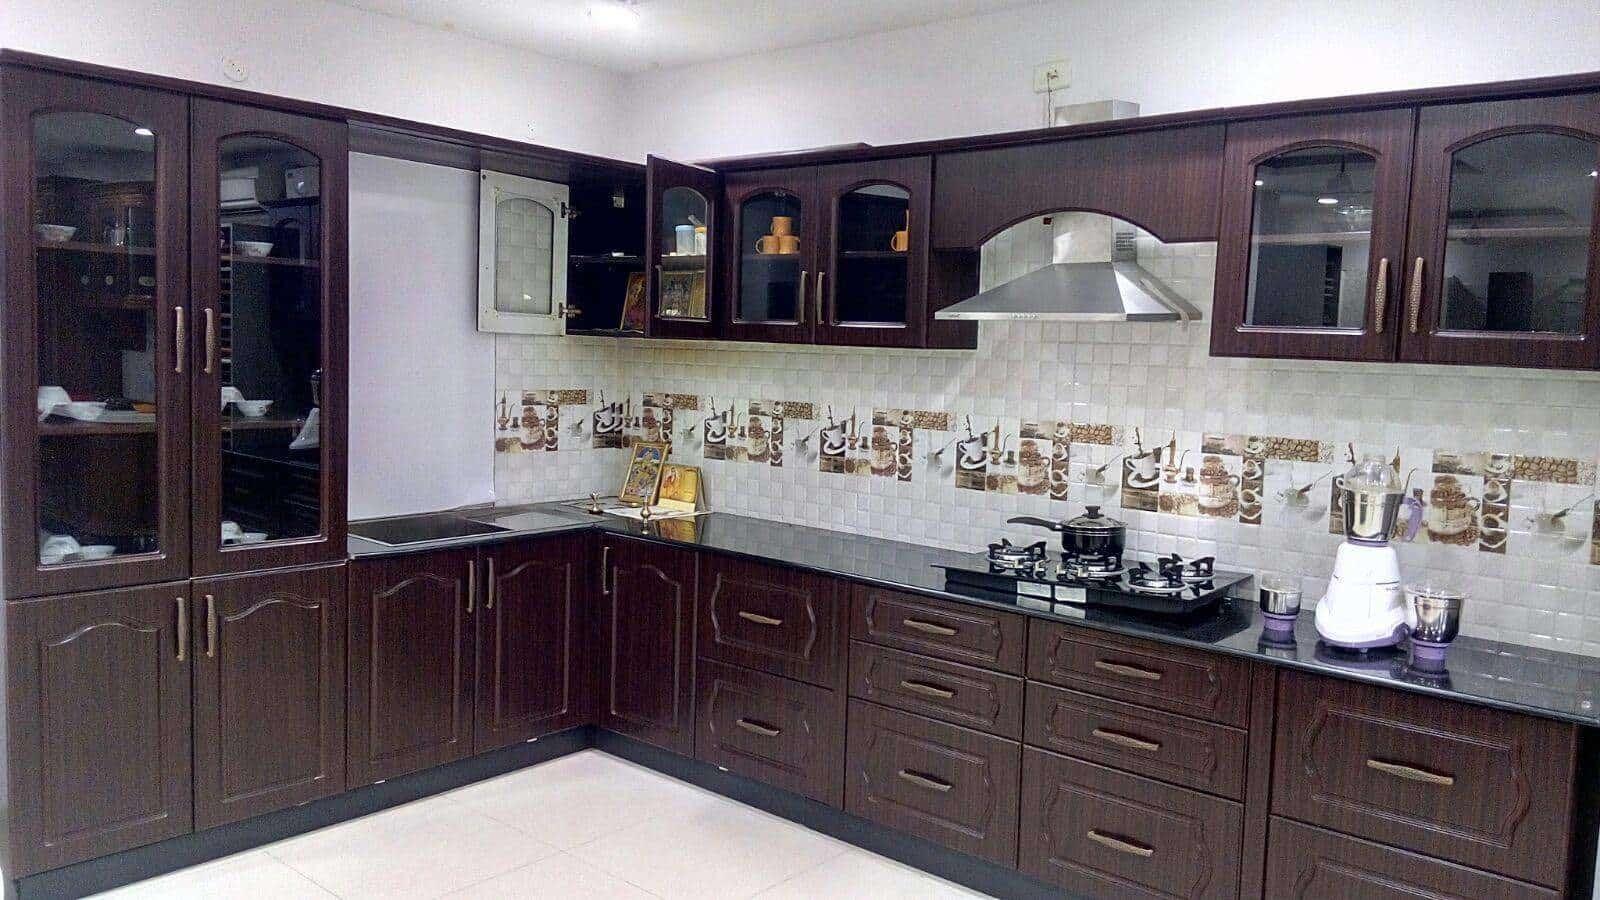 Fein Godrej Interio Modulare Küche Preis In Bangalore Ideen - Küche ...